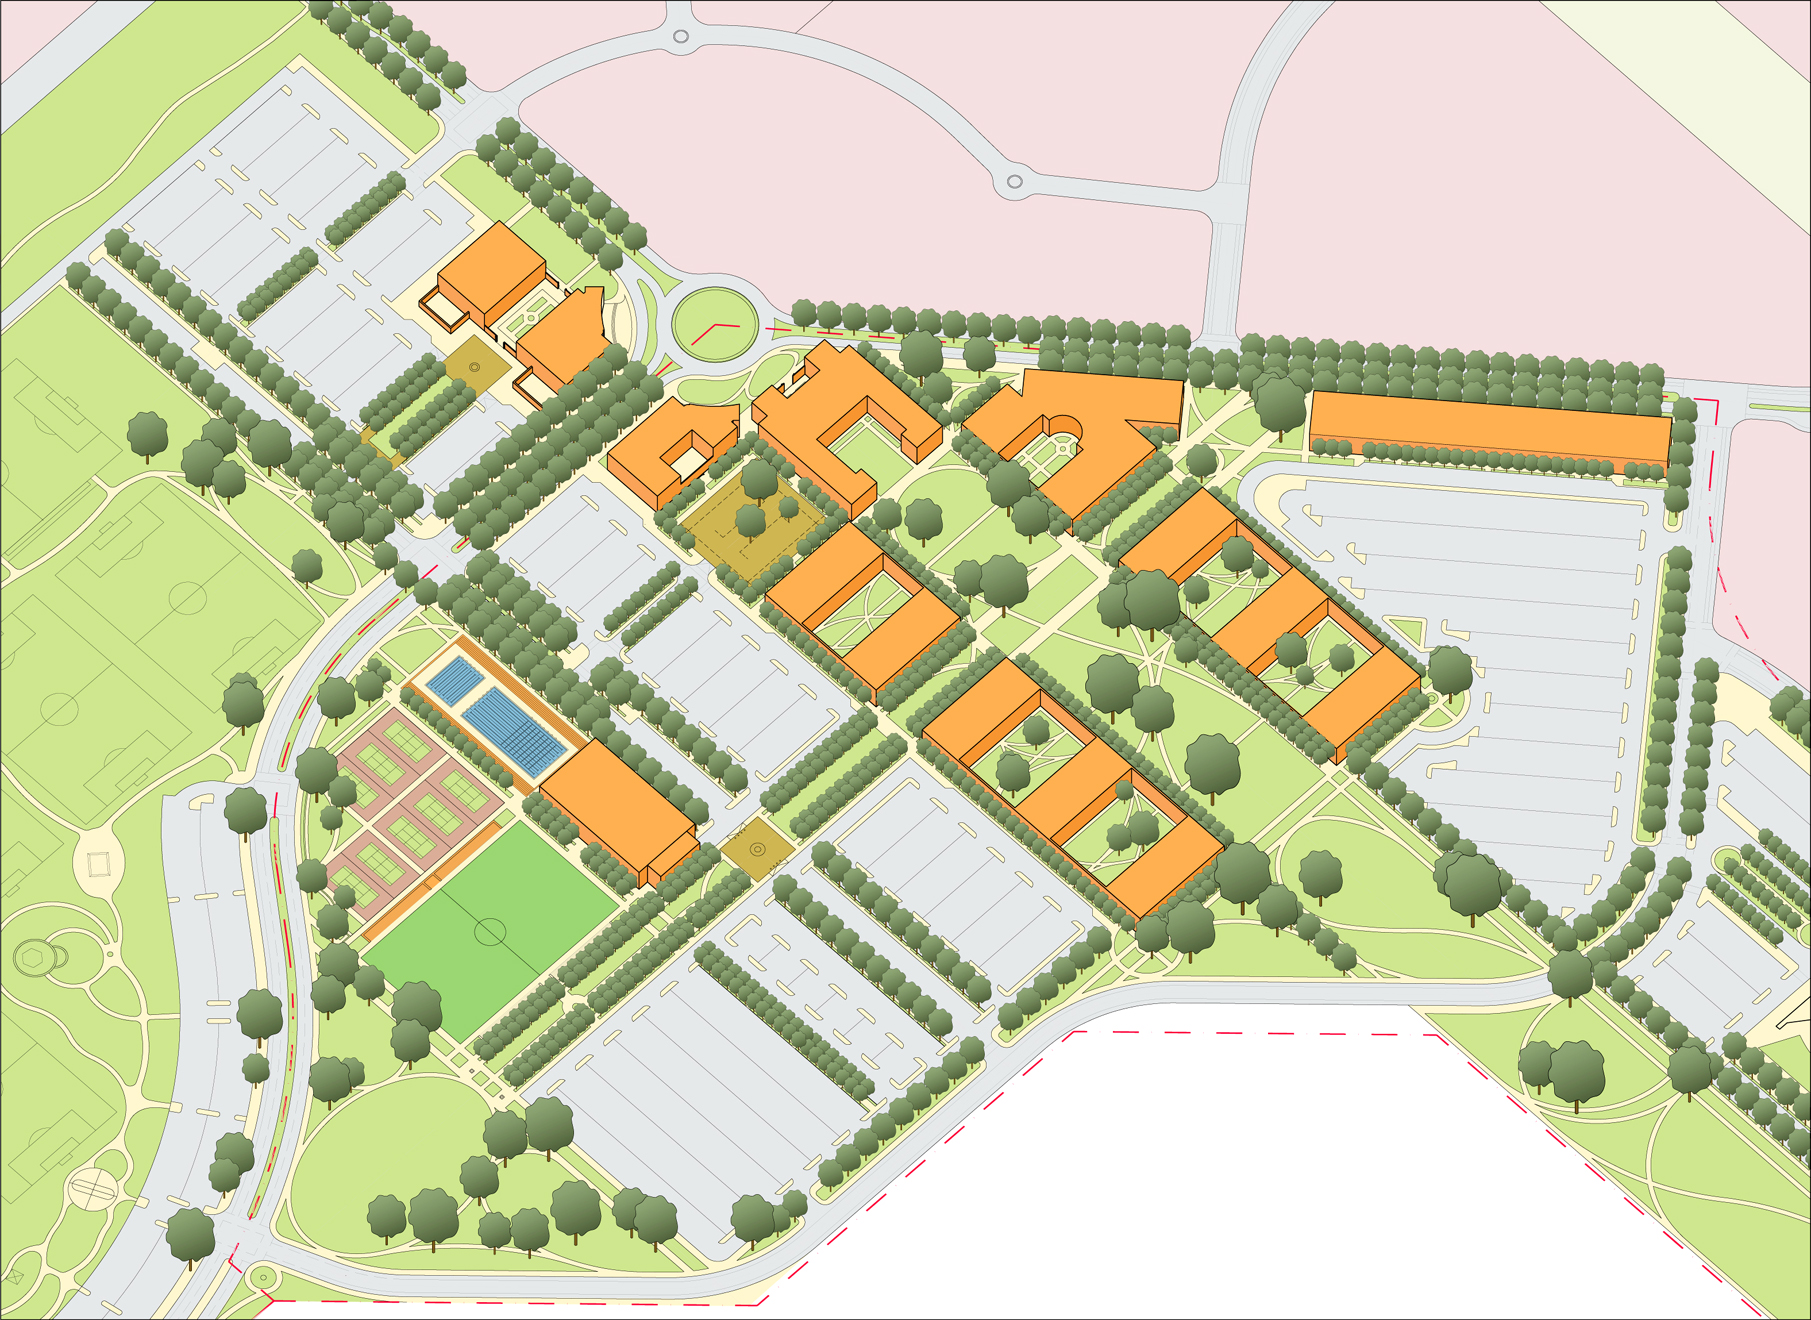 Chino campus 30 year master plan axonometric